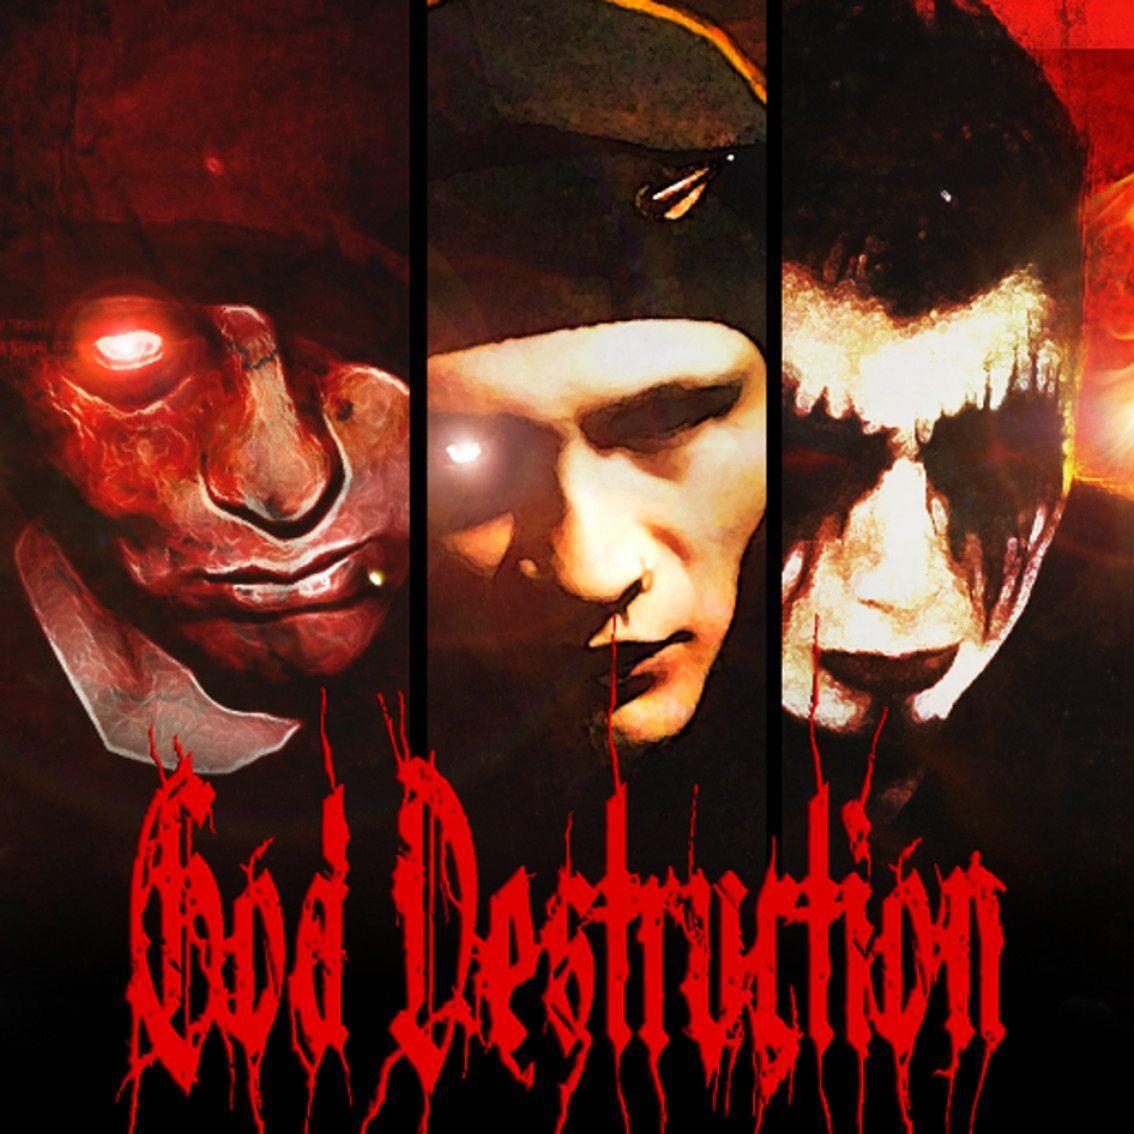 Side-Line introduces God Destruction - listen now to 'Kakuma (The Unholy Land)' (Face The Beat profile series)